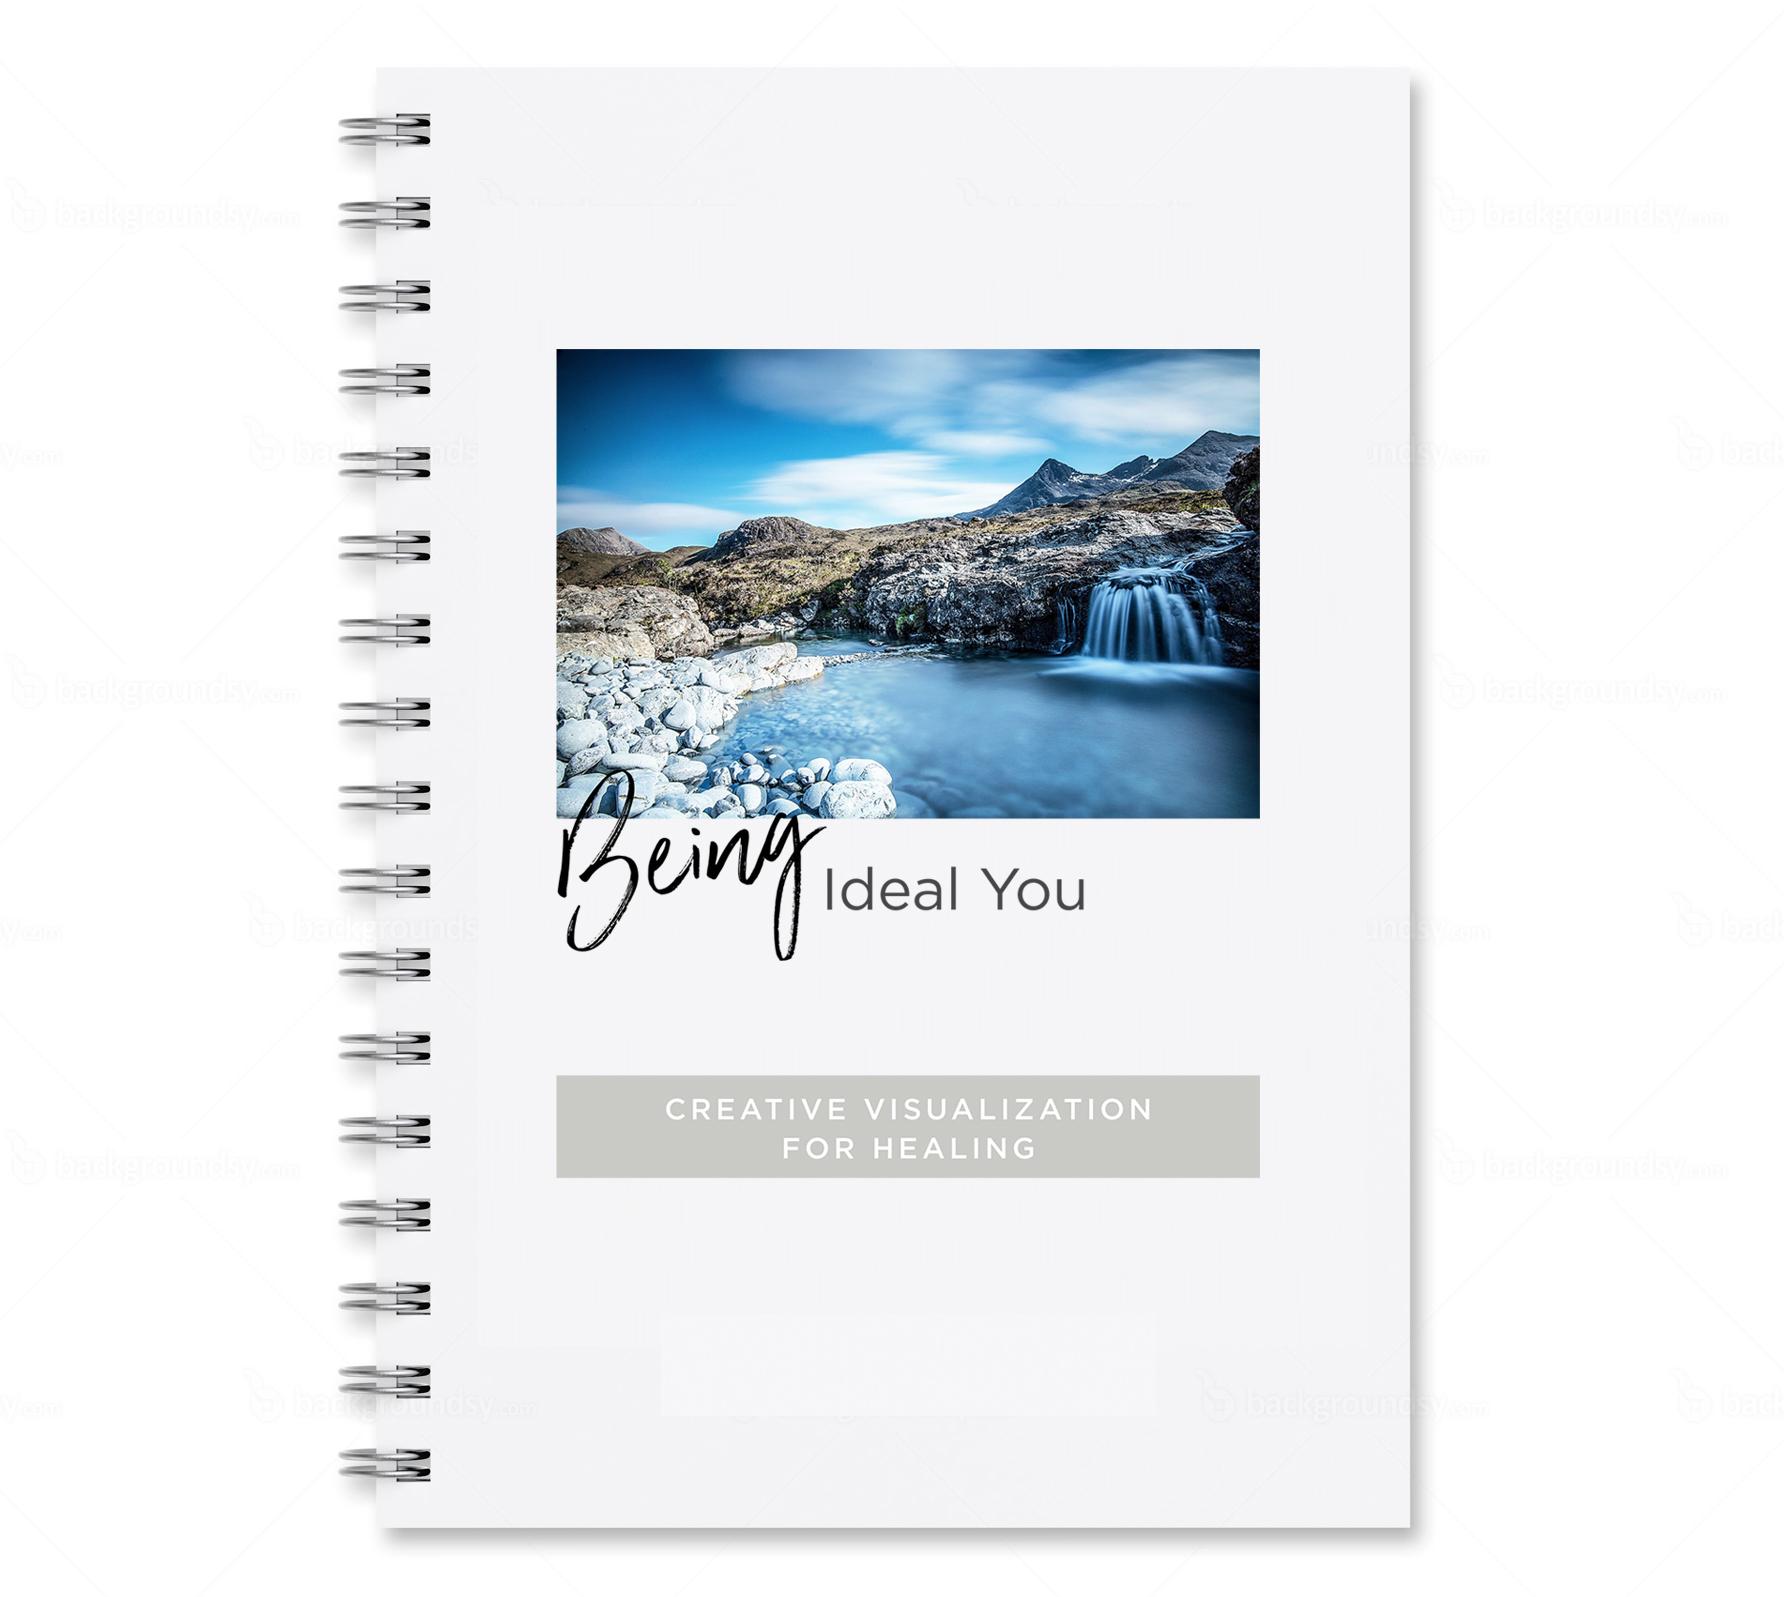 BIY-Notebook-sq.jpg